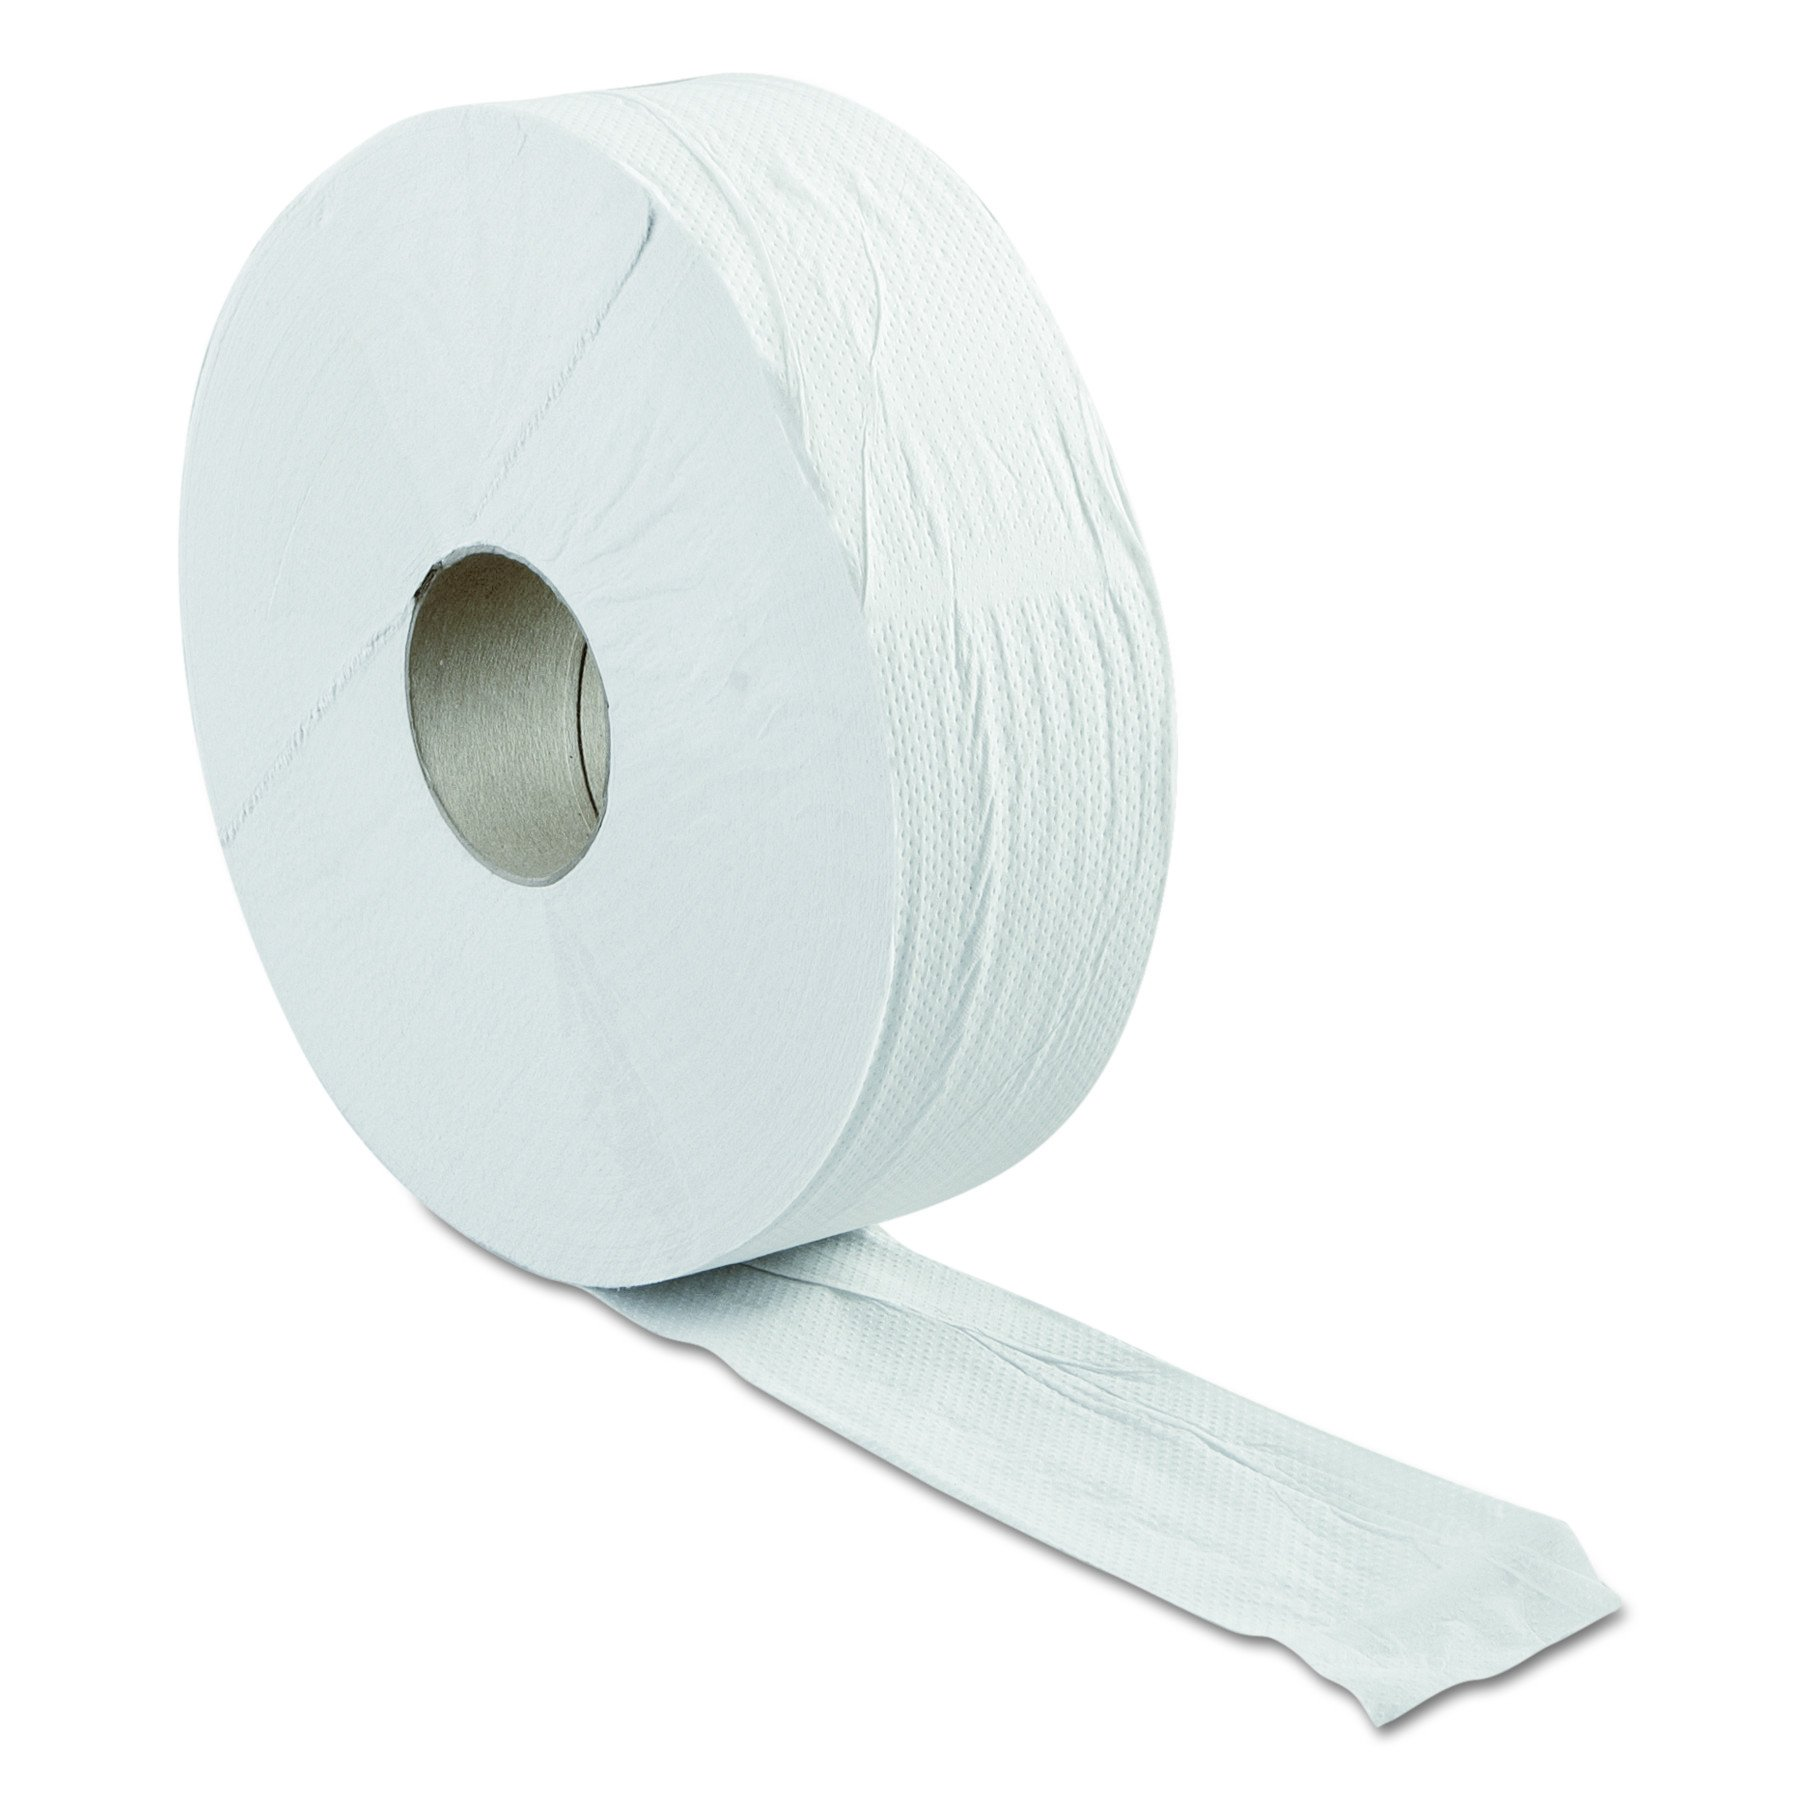 Green Haritage 062 12'' Diameter x 3.42'' Width, Economy Size, 2-Ply Jumbo Roll Bathroom Tissue (Case of 6)